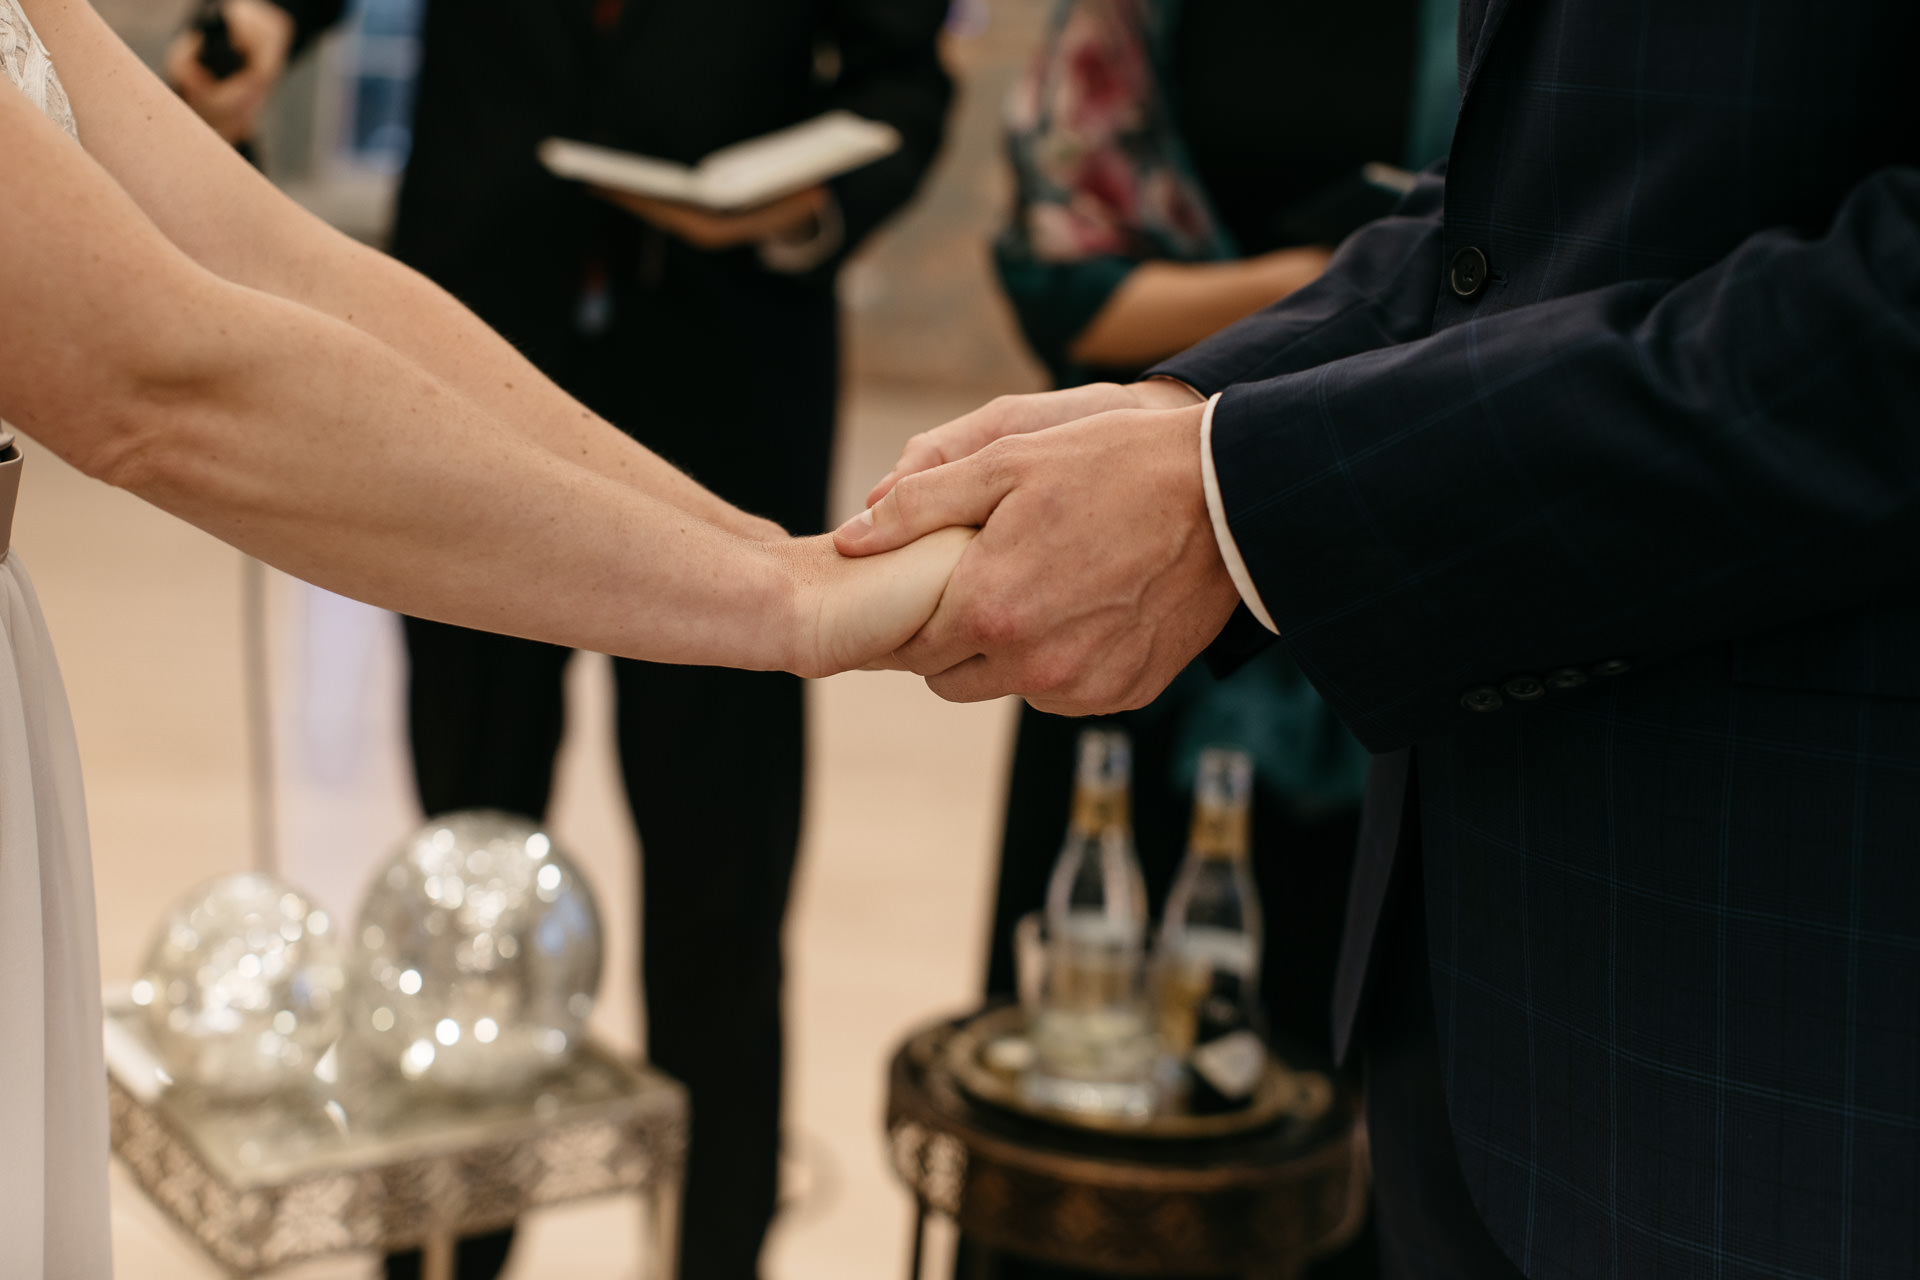 Massachusetts Wedding Photographer . Mass Moca Museum Wedding in North Adams by Jean-Laurent Gaudy